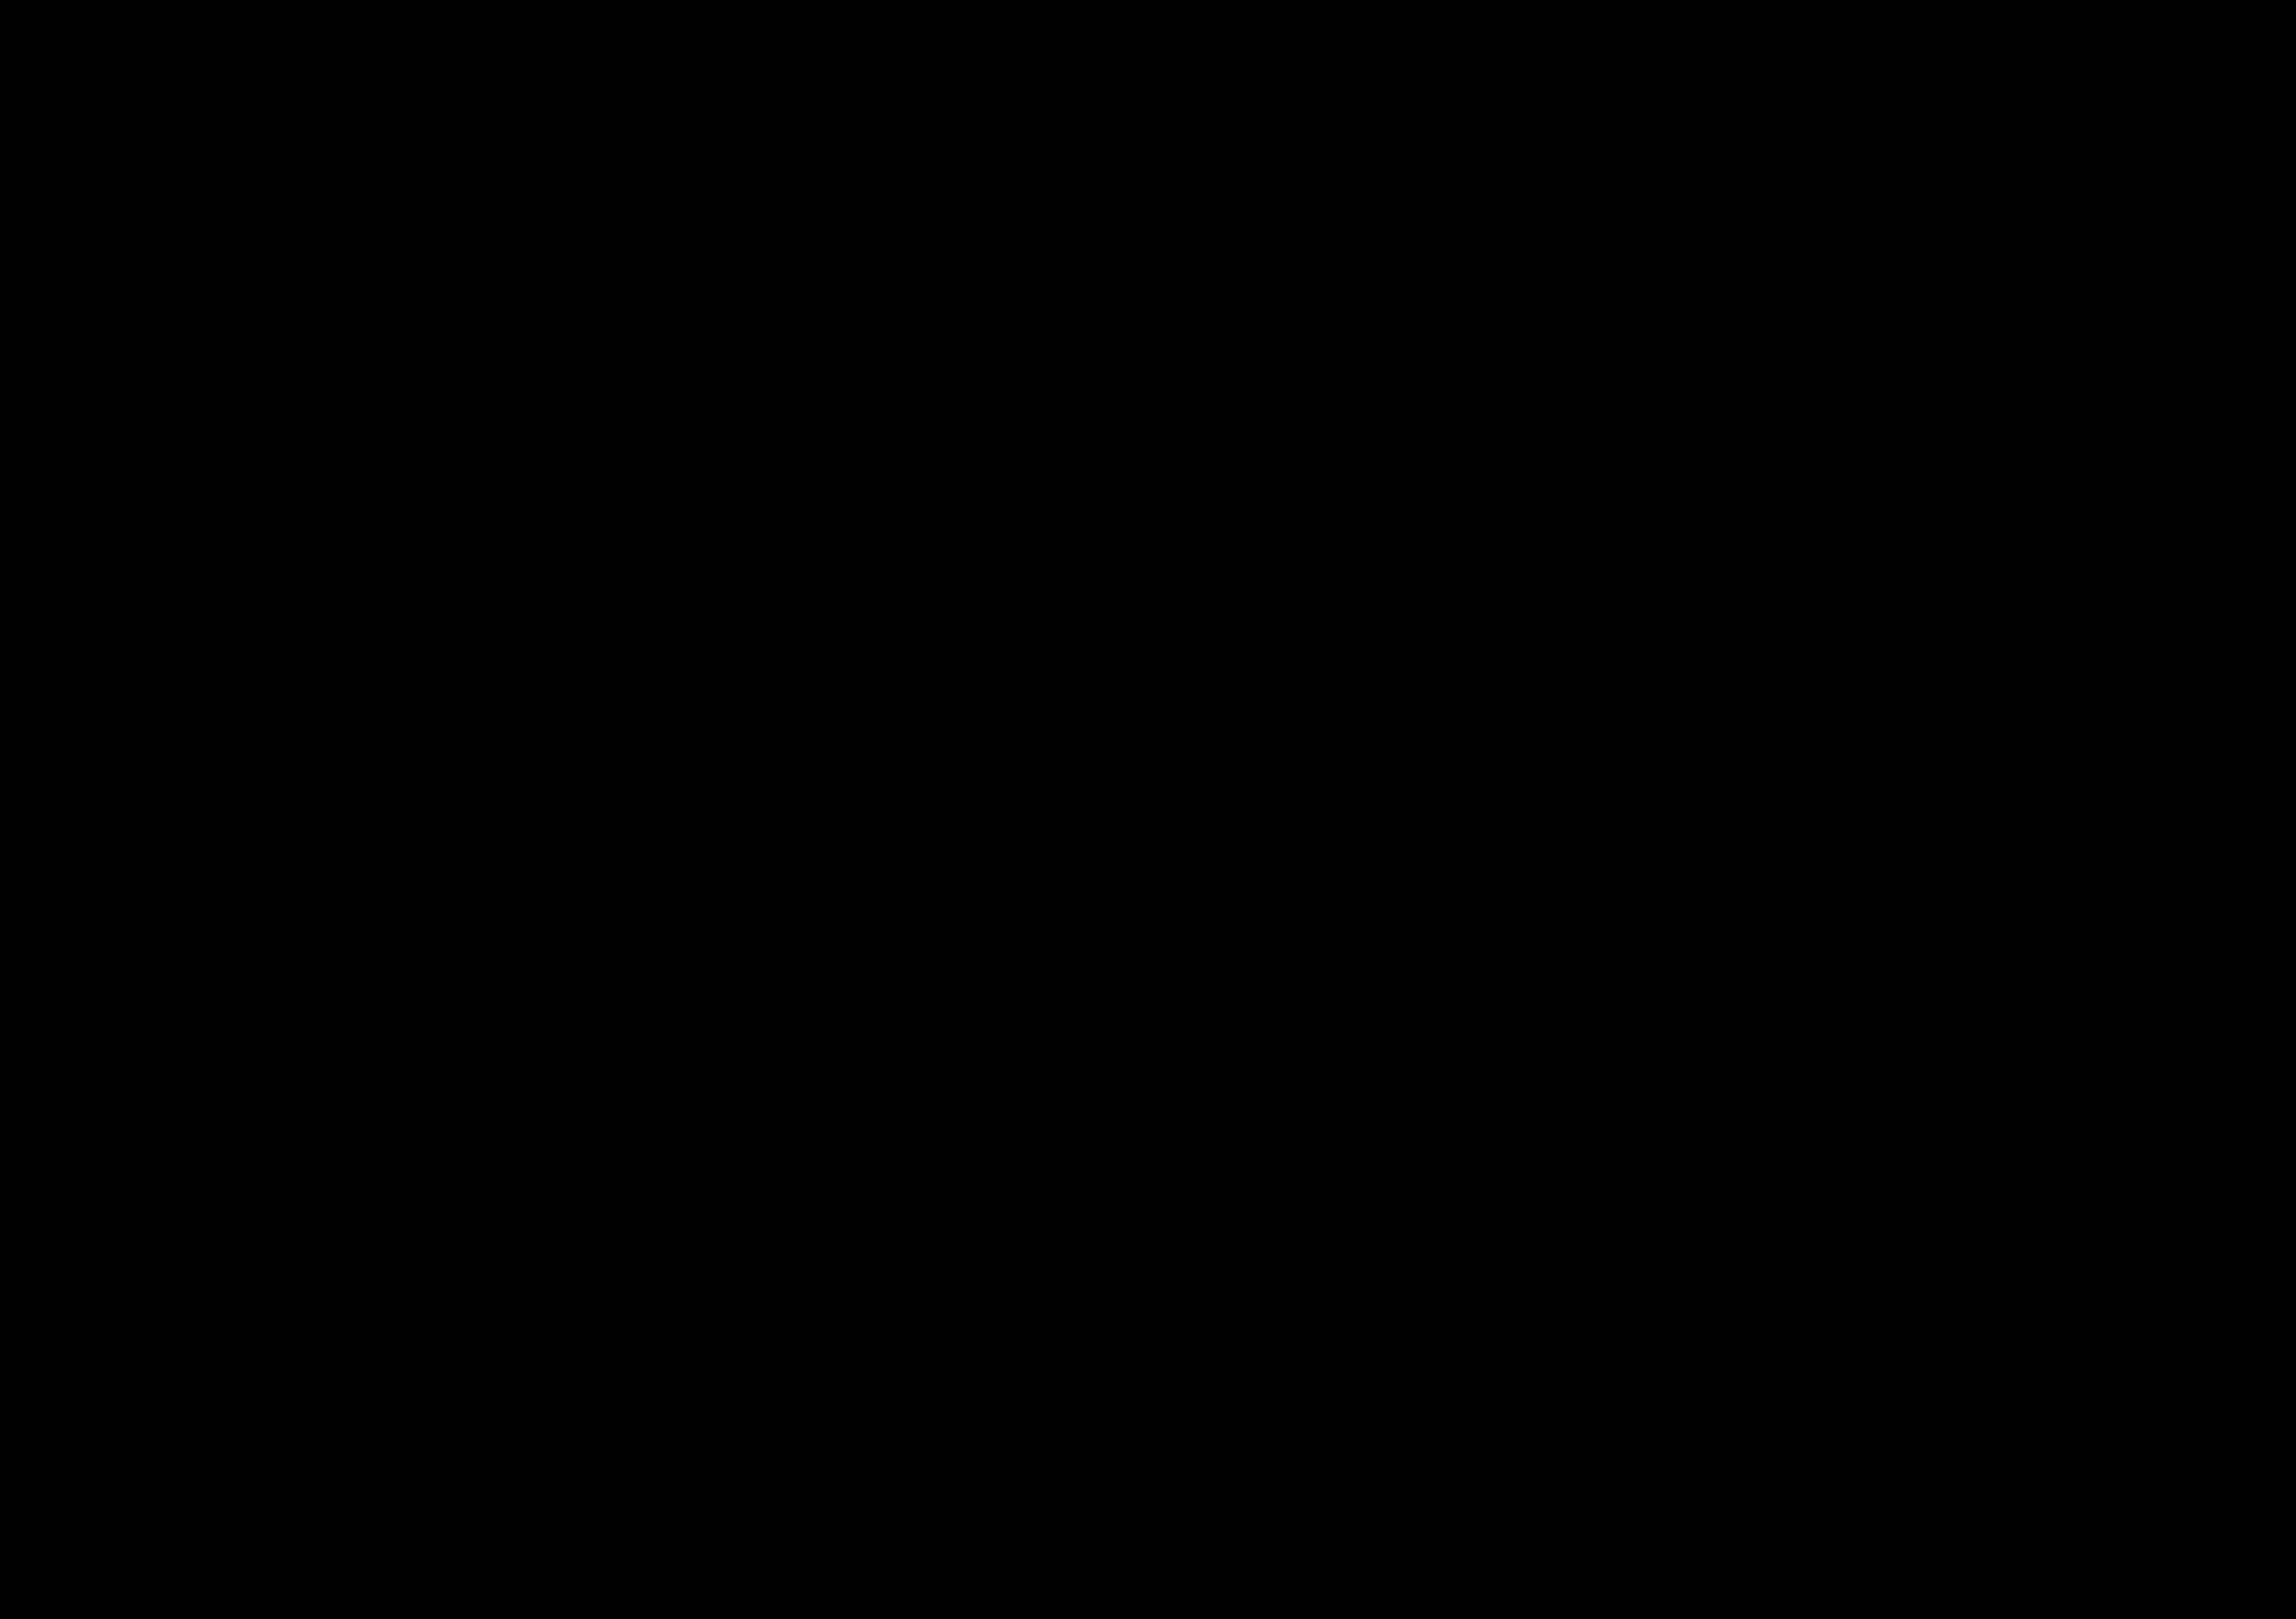 2400x1692 Clipart